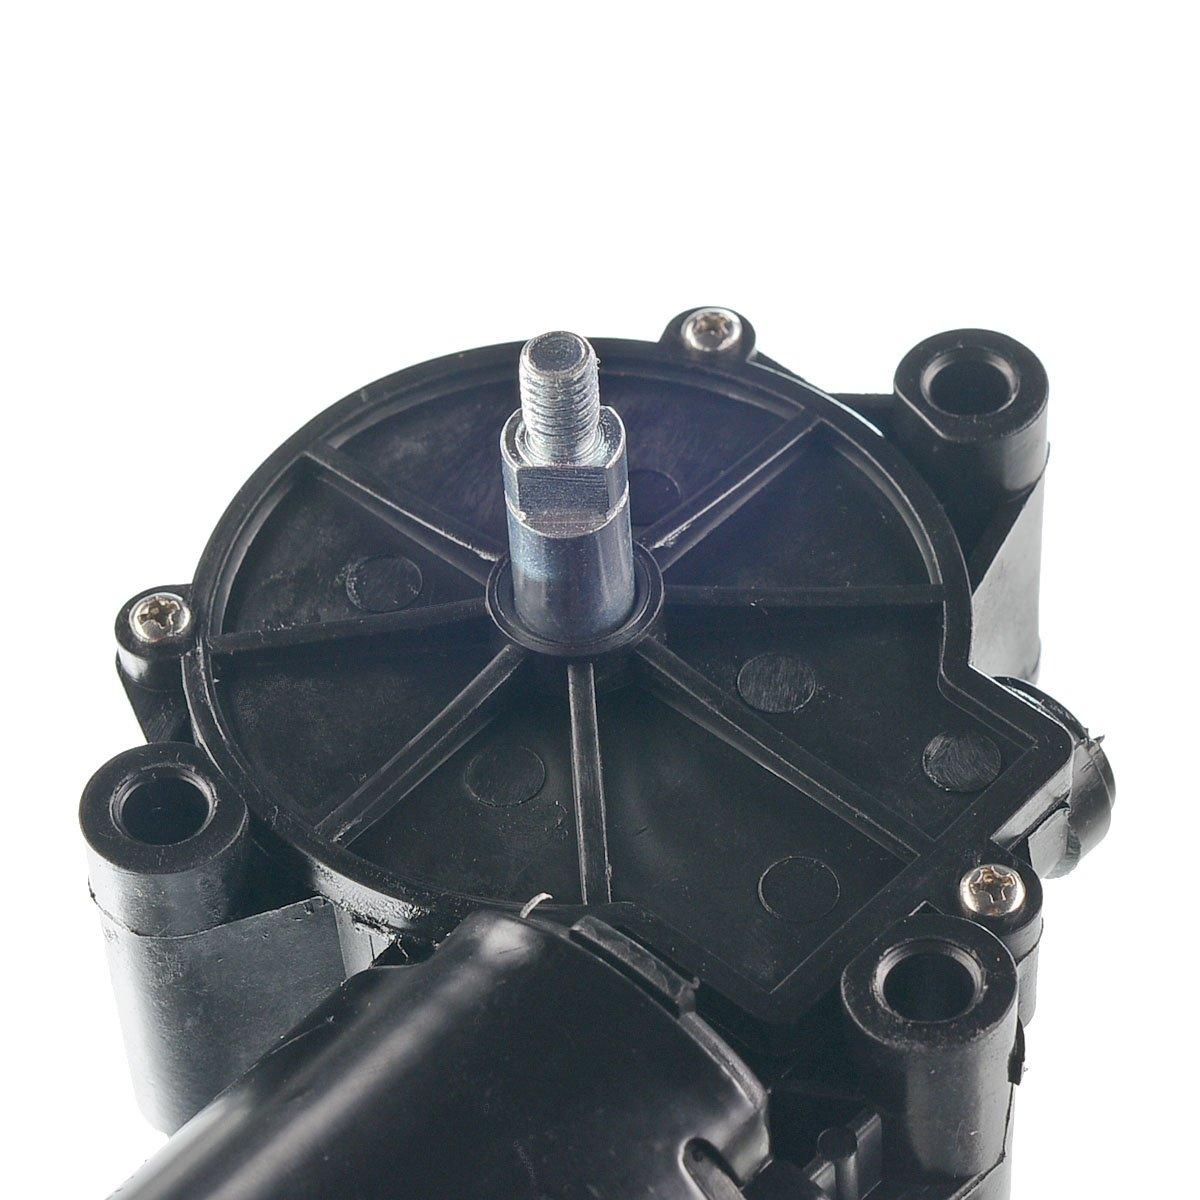 A-Premium Headlight Headlamp Motor for Pontiac Firebird 1998-2002 Front/Left/Driver/Side